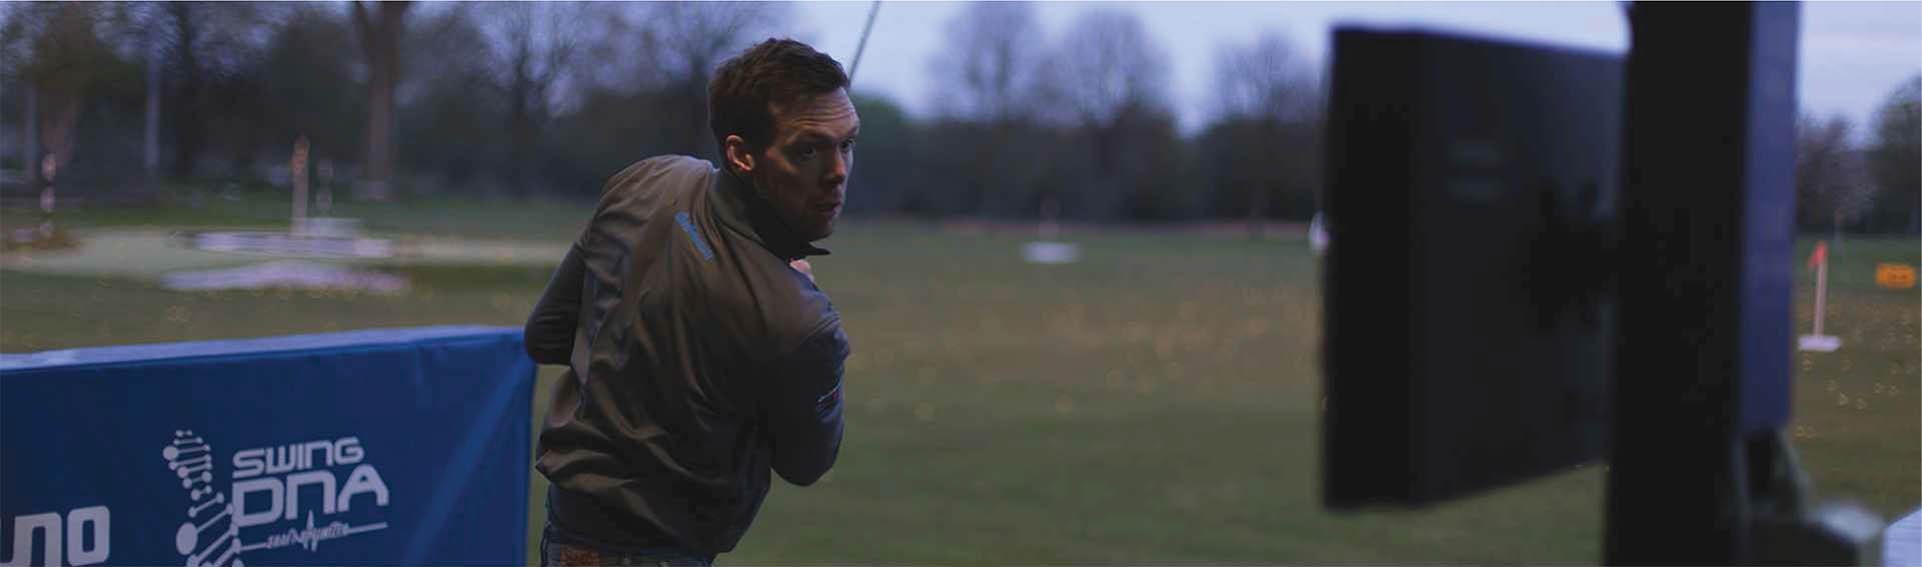 Charnwood Golf & Leisure Complex